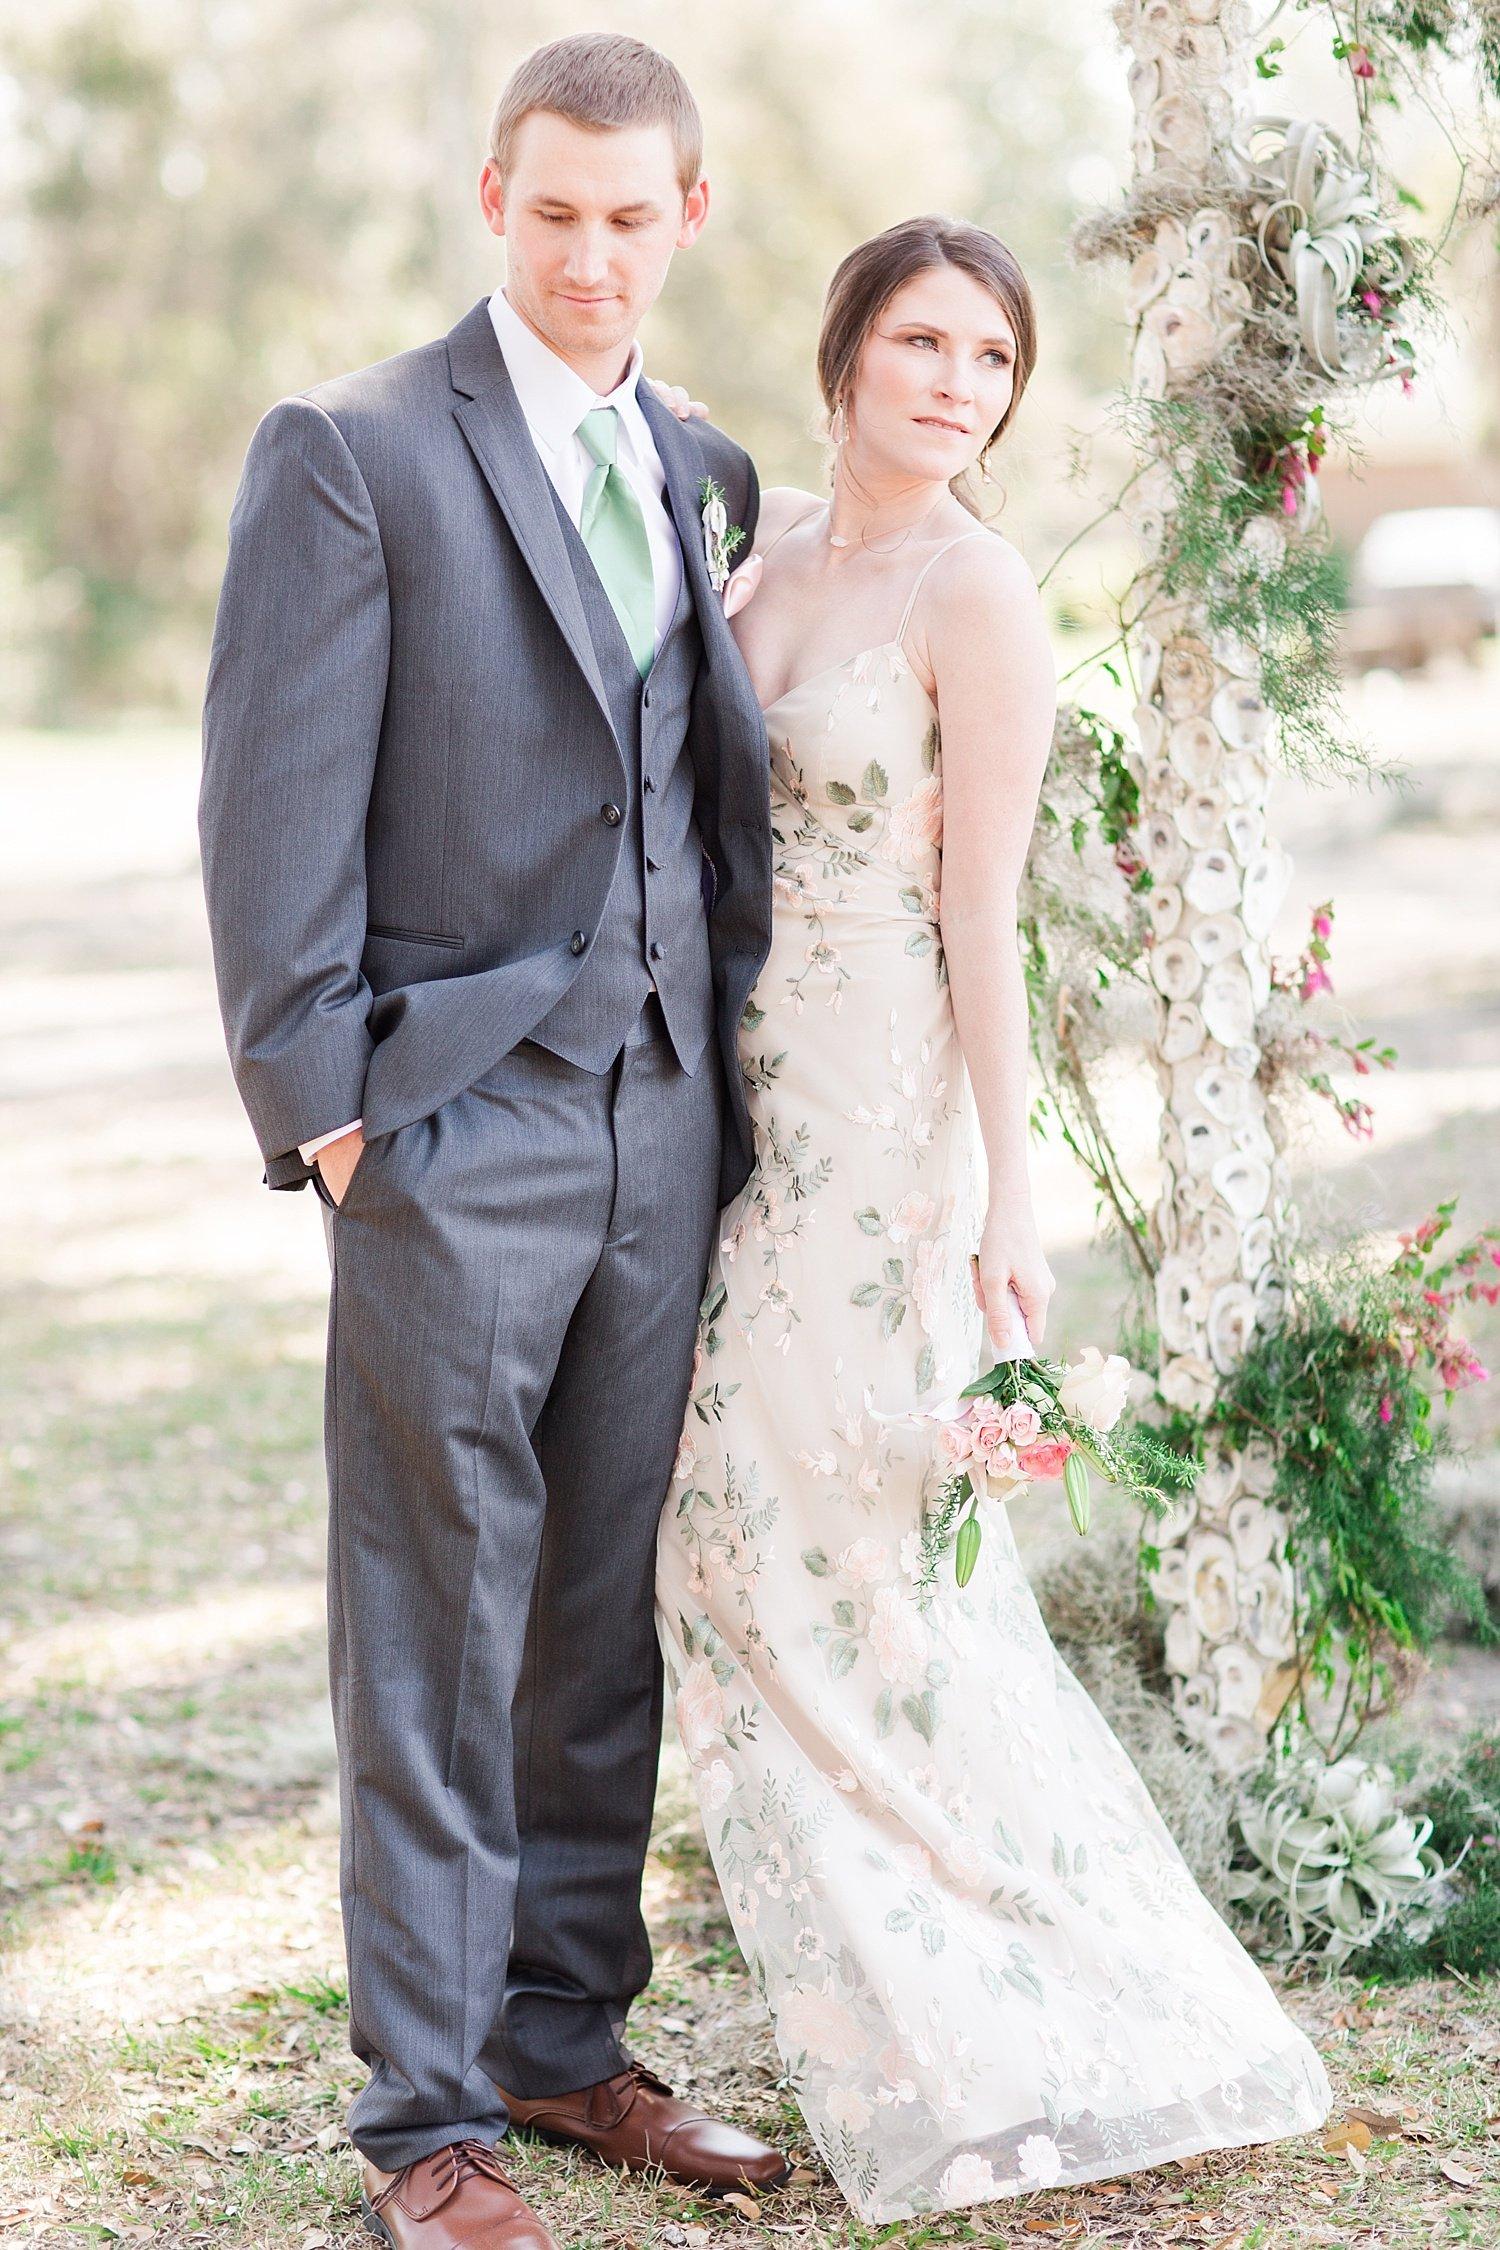 rachel-strickland-photography-katie-may-ivory-and-beau-bridal-boutique-bethesda-academy-wedding-whitfield-chapel-wedding-savannah-bridal-boutique-savannah-weddings-savannah-wedding-savannah-wedding-planner-savannah-bridal-gowns-savannah-bride-15.jpg